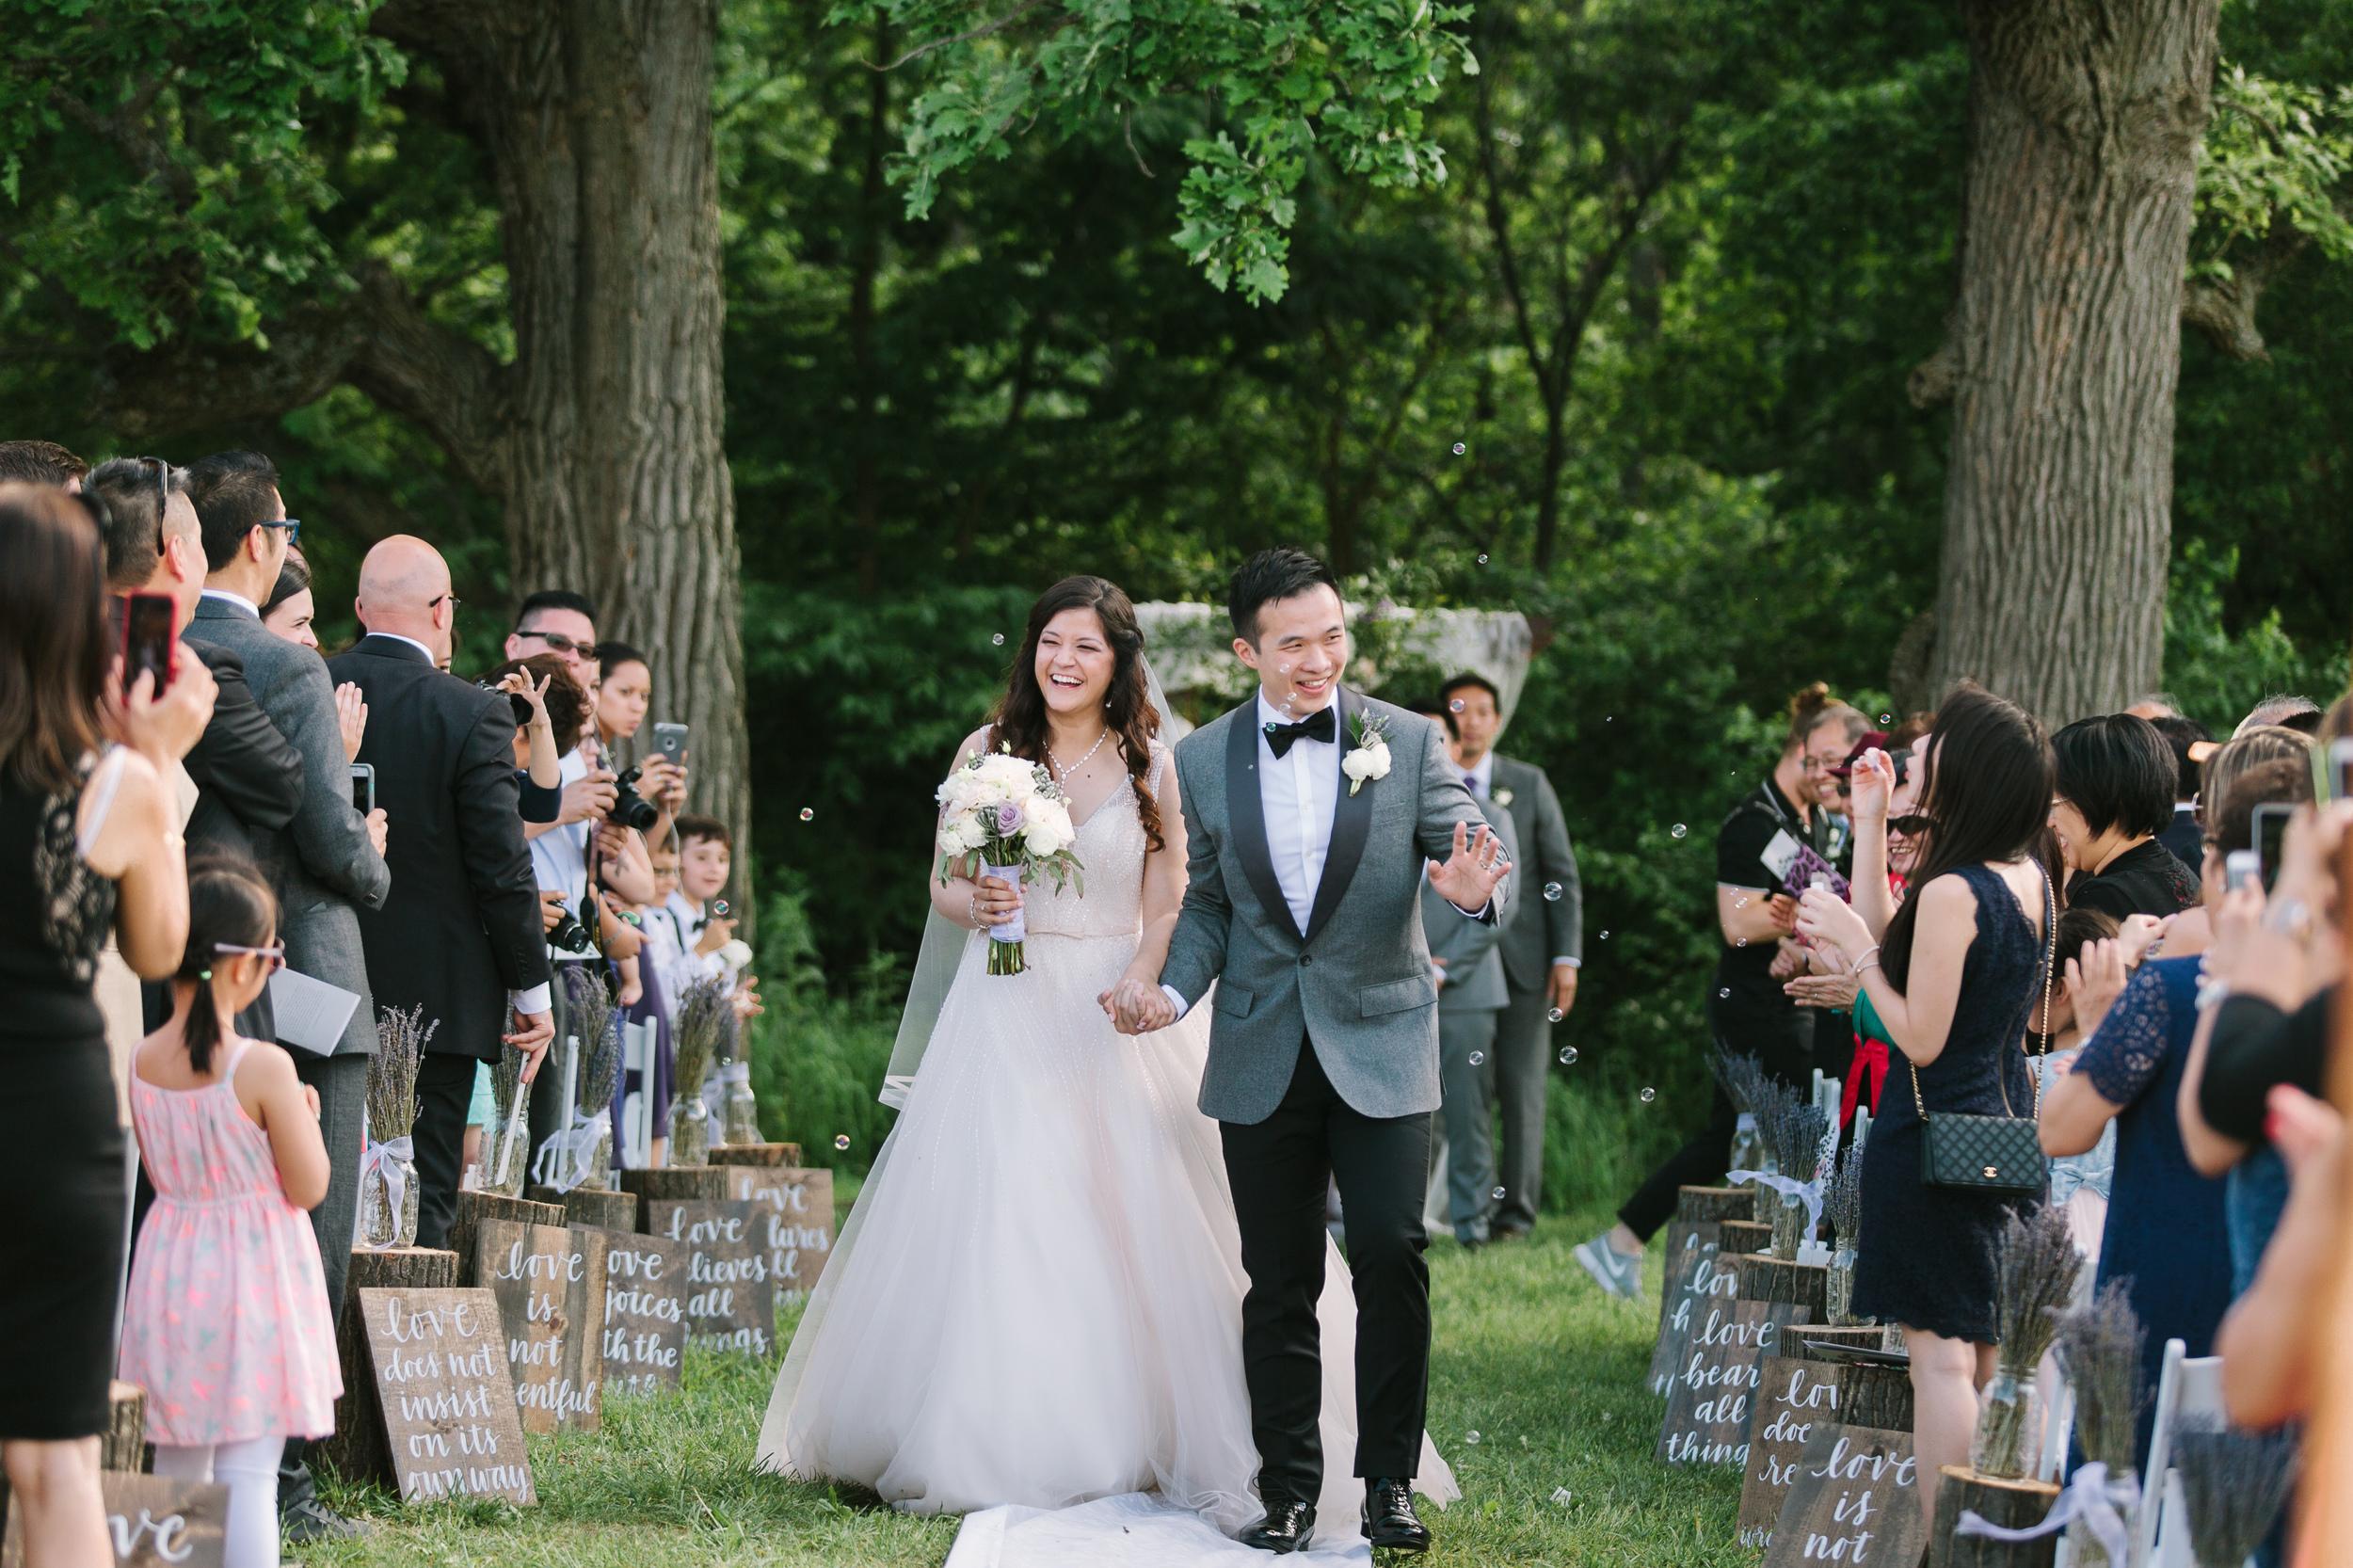 Nicodem Creative_Blog_Leung Wedding_The Pavilion at Orchad Ridge Farms_Rockton Illinois-41.jpg